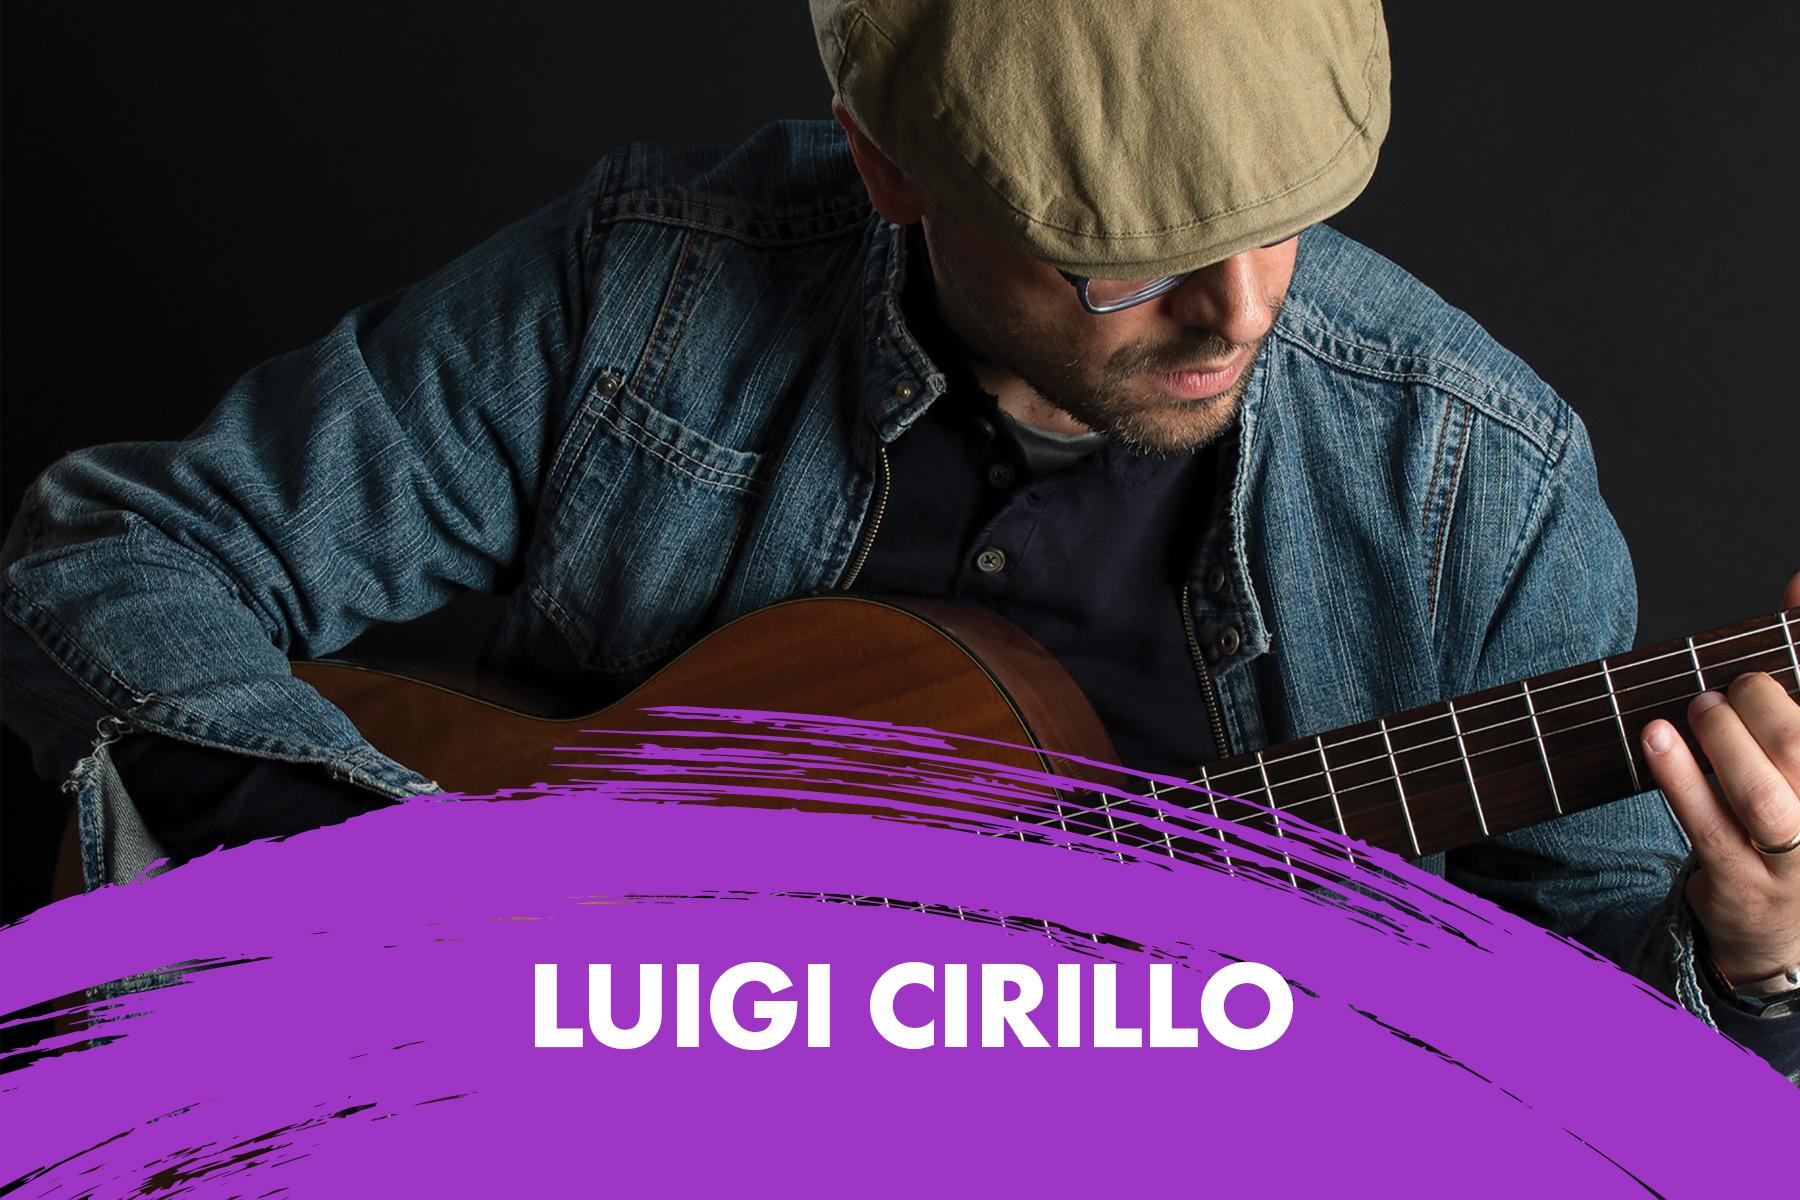 Luigi-Cirillo_large.jpg